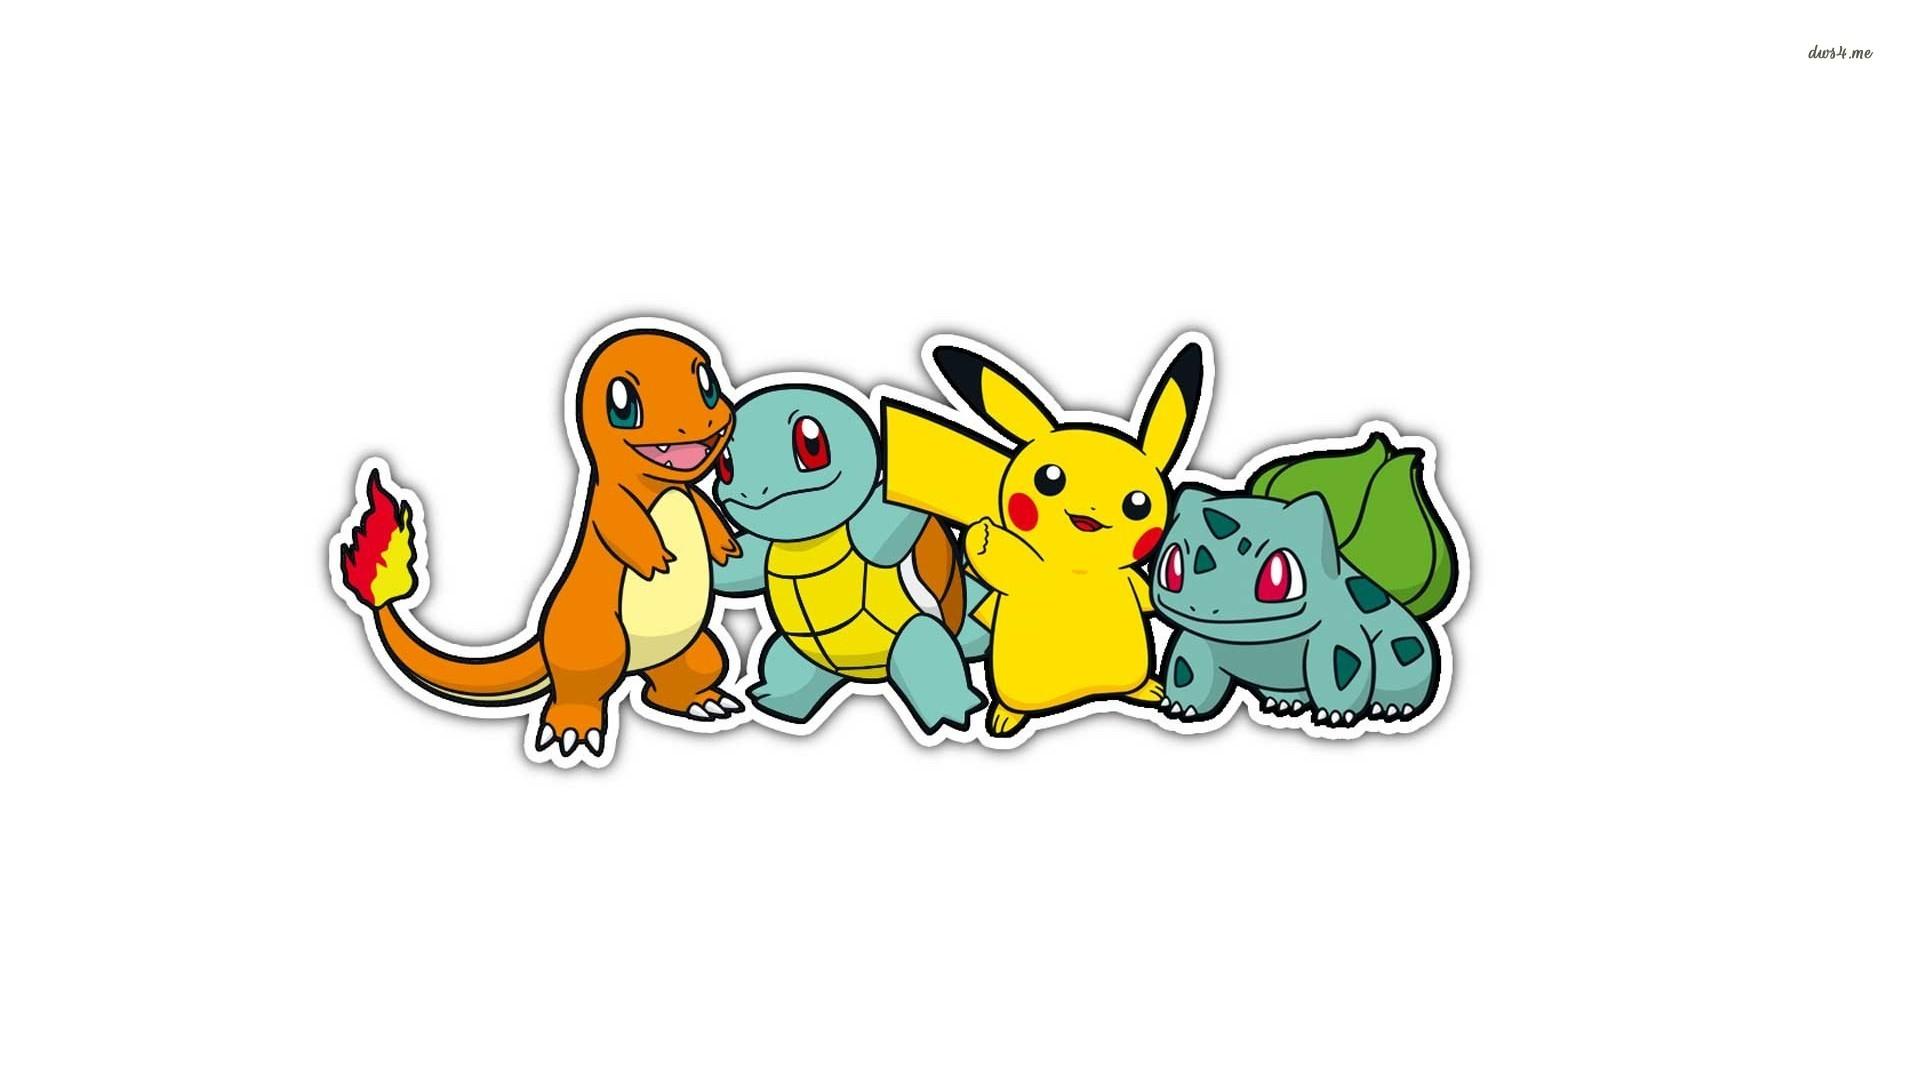 Download Pokemon Wallpaper 1920x1080 Full HD Wallpapers 1920x1080